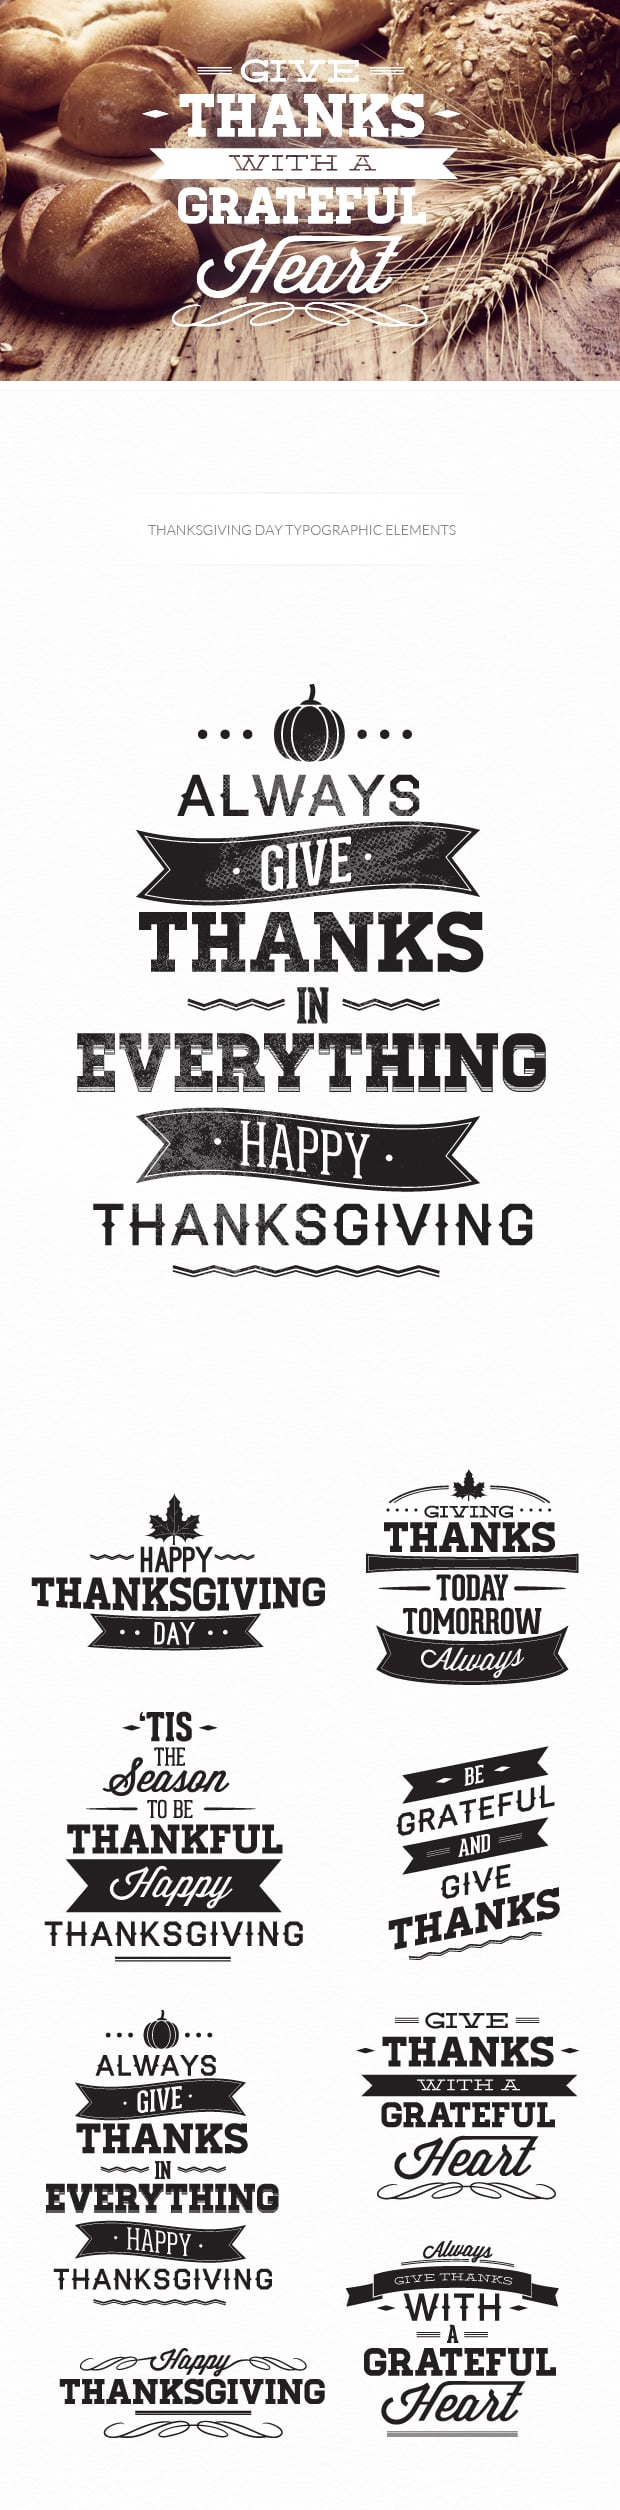 Thanksgiving typographic elements TypeZilla thanksgiving preview